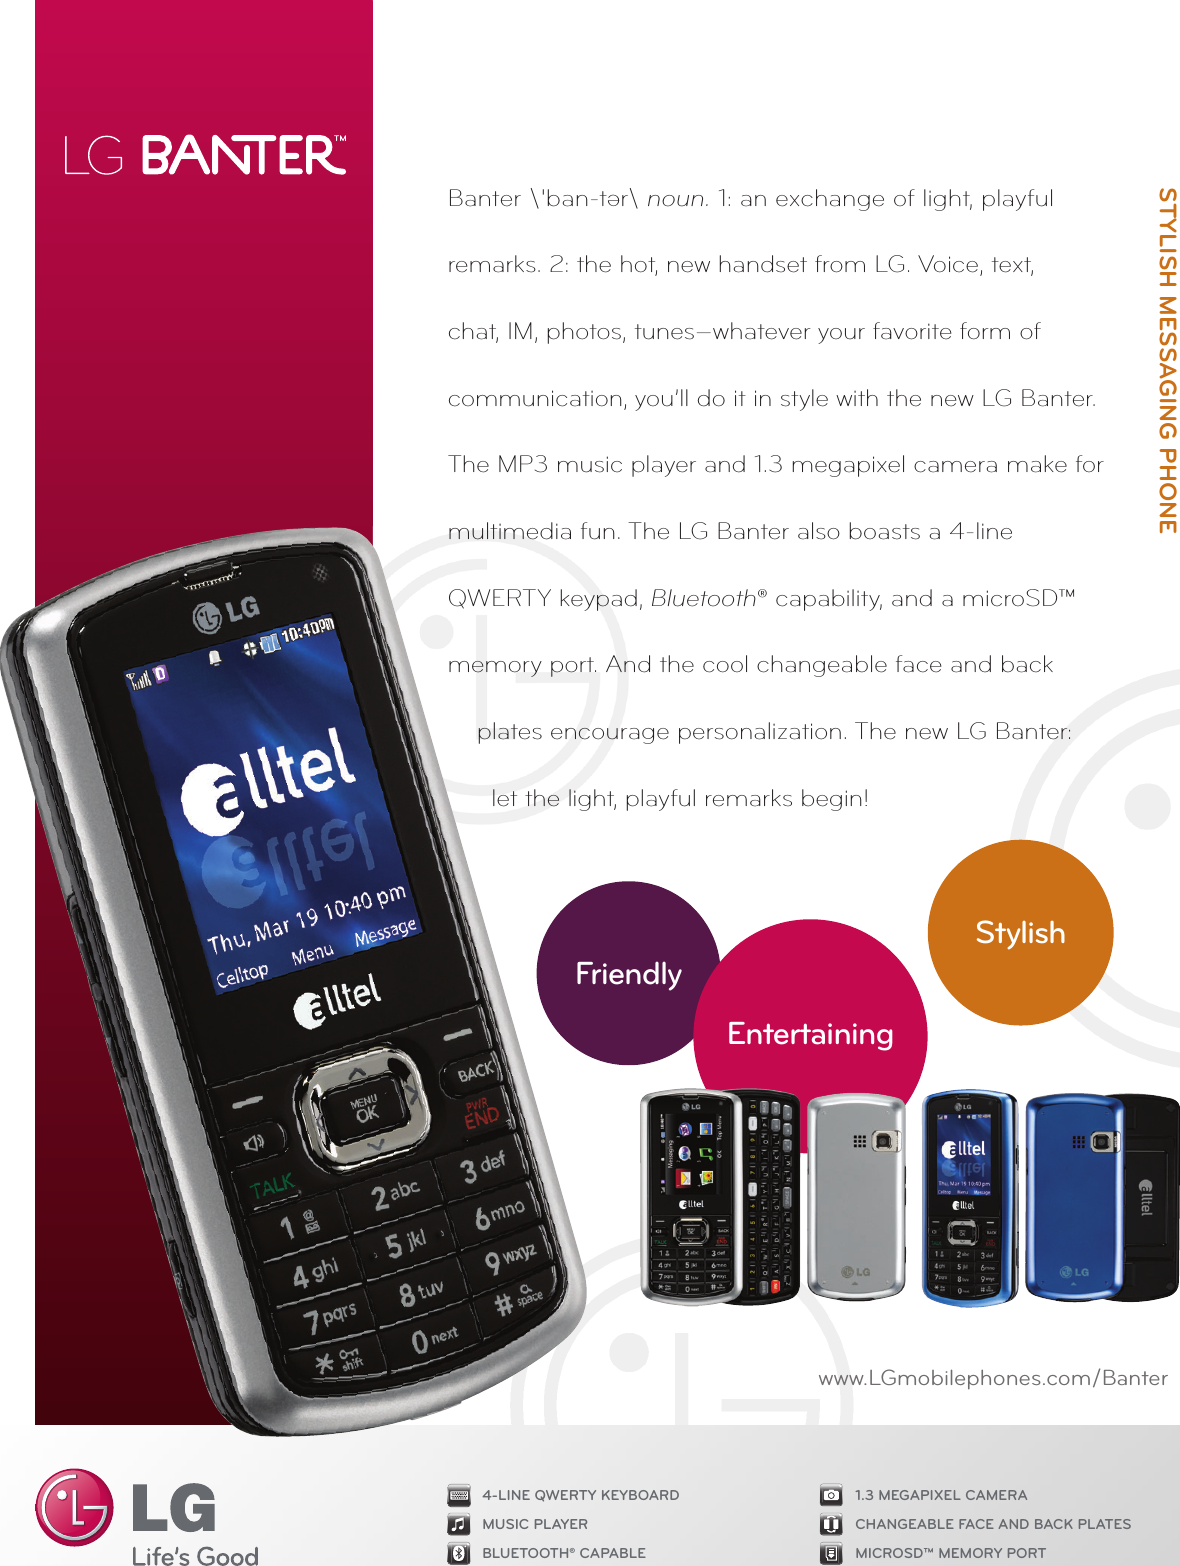 lg ax265 datasheet banter lg user manual data sheet banter ds rh usermanual wiki LG Cell Phone Operating Manual LG Cell Phone Operating Manual